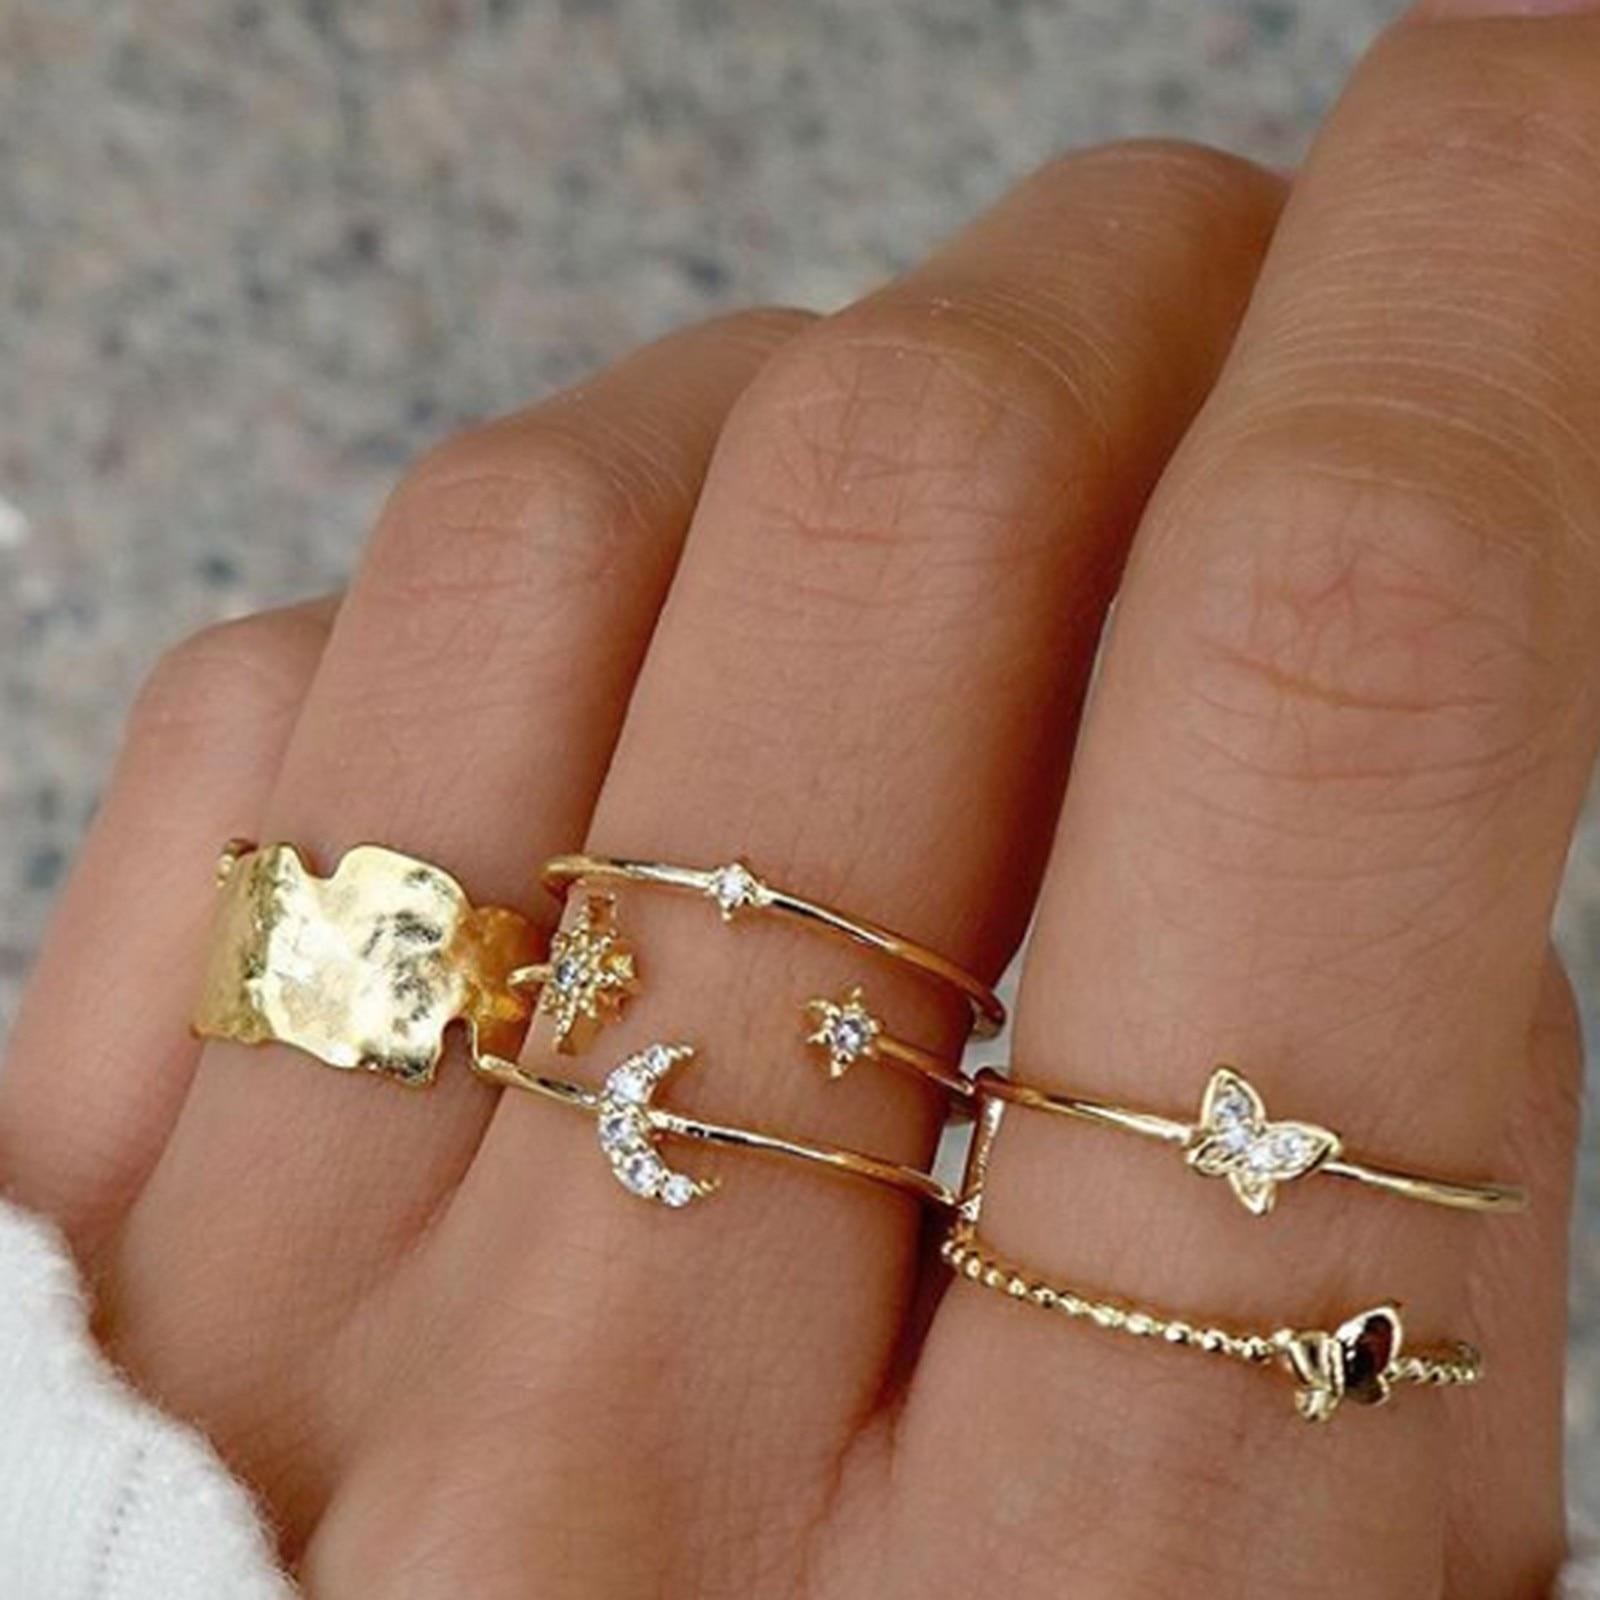 Vento frio geométrico banhado a ouro europeu e americano anel conjunto elegante requintado produto entrega rápida anillo